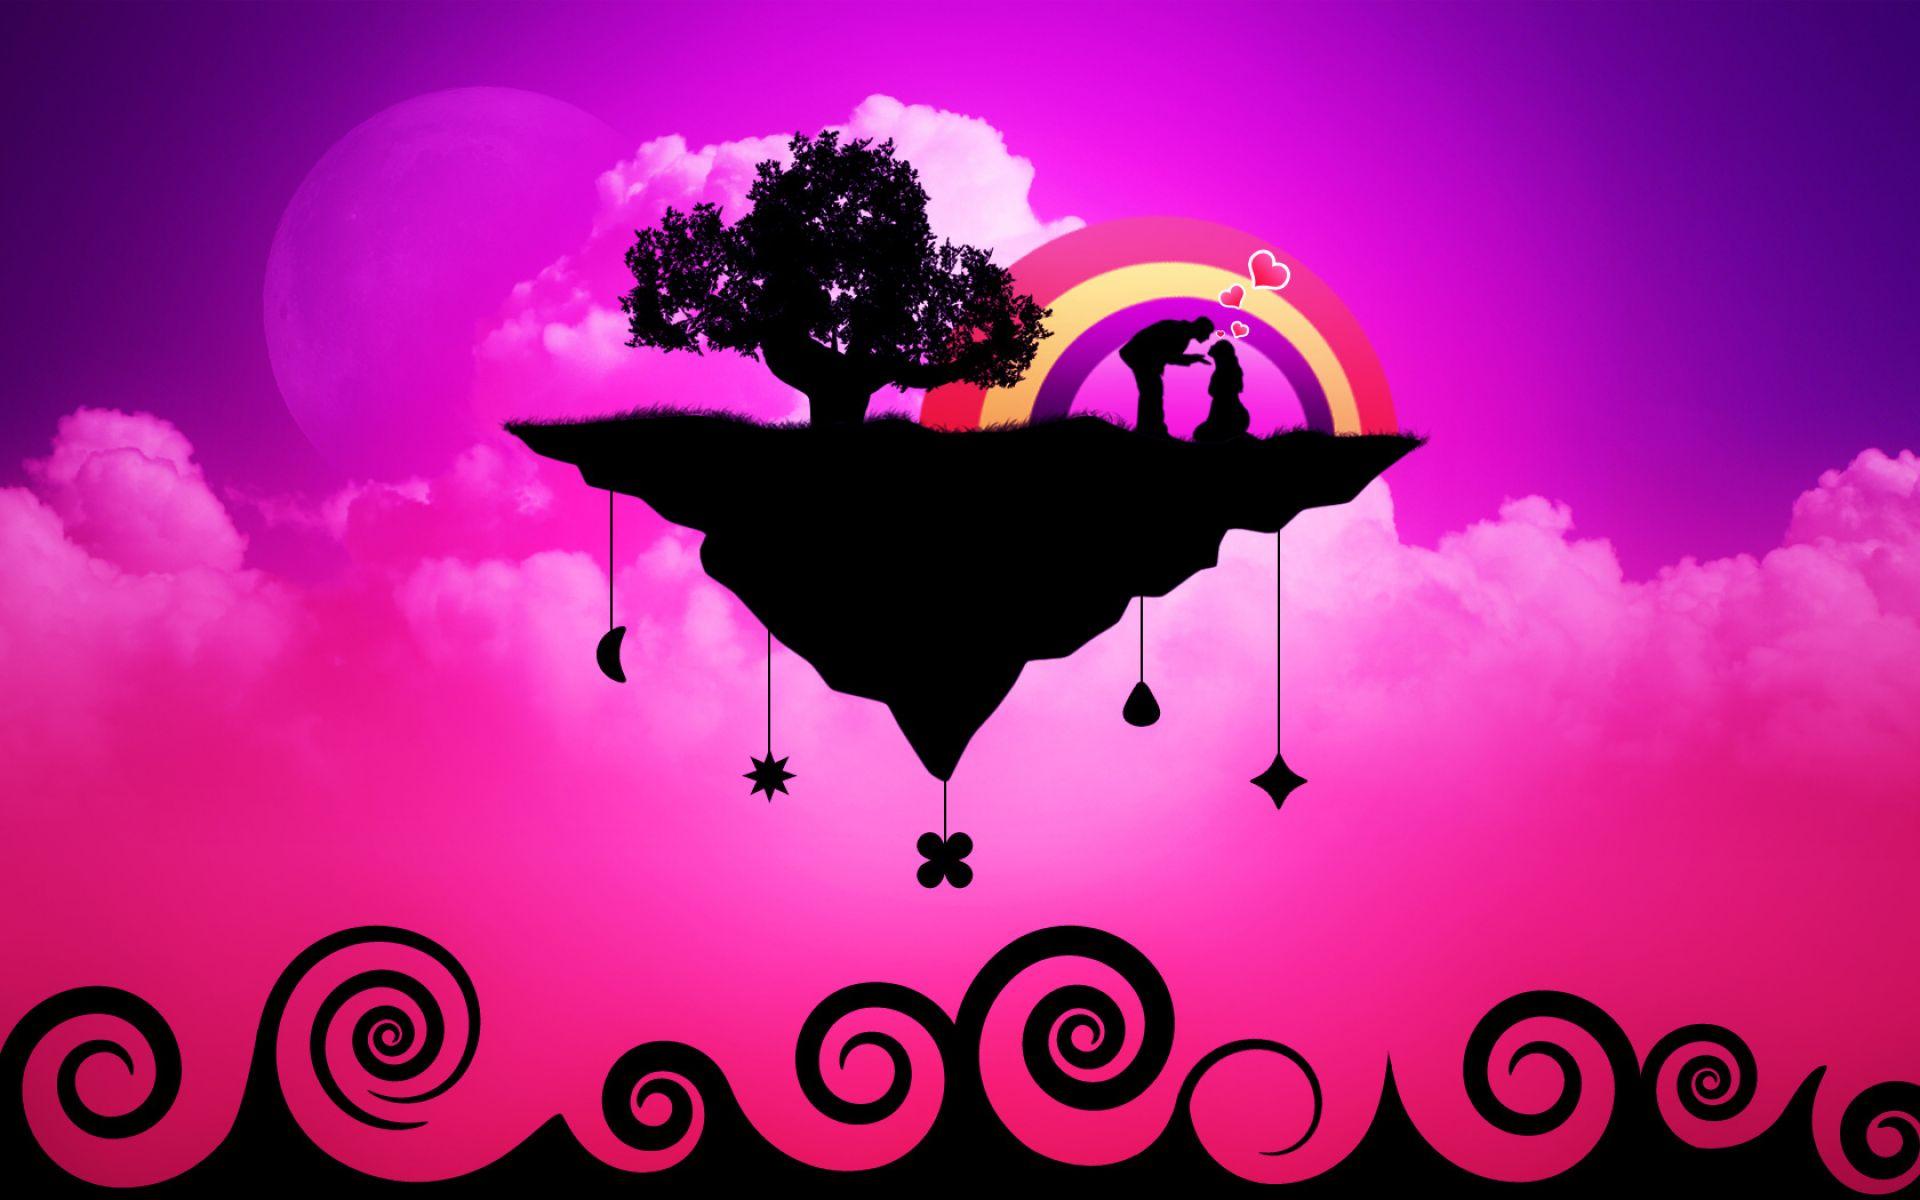 Dream Love Wallpaper   Dream Love 76978   HD Wallpaper Download 1920x1200